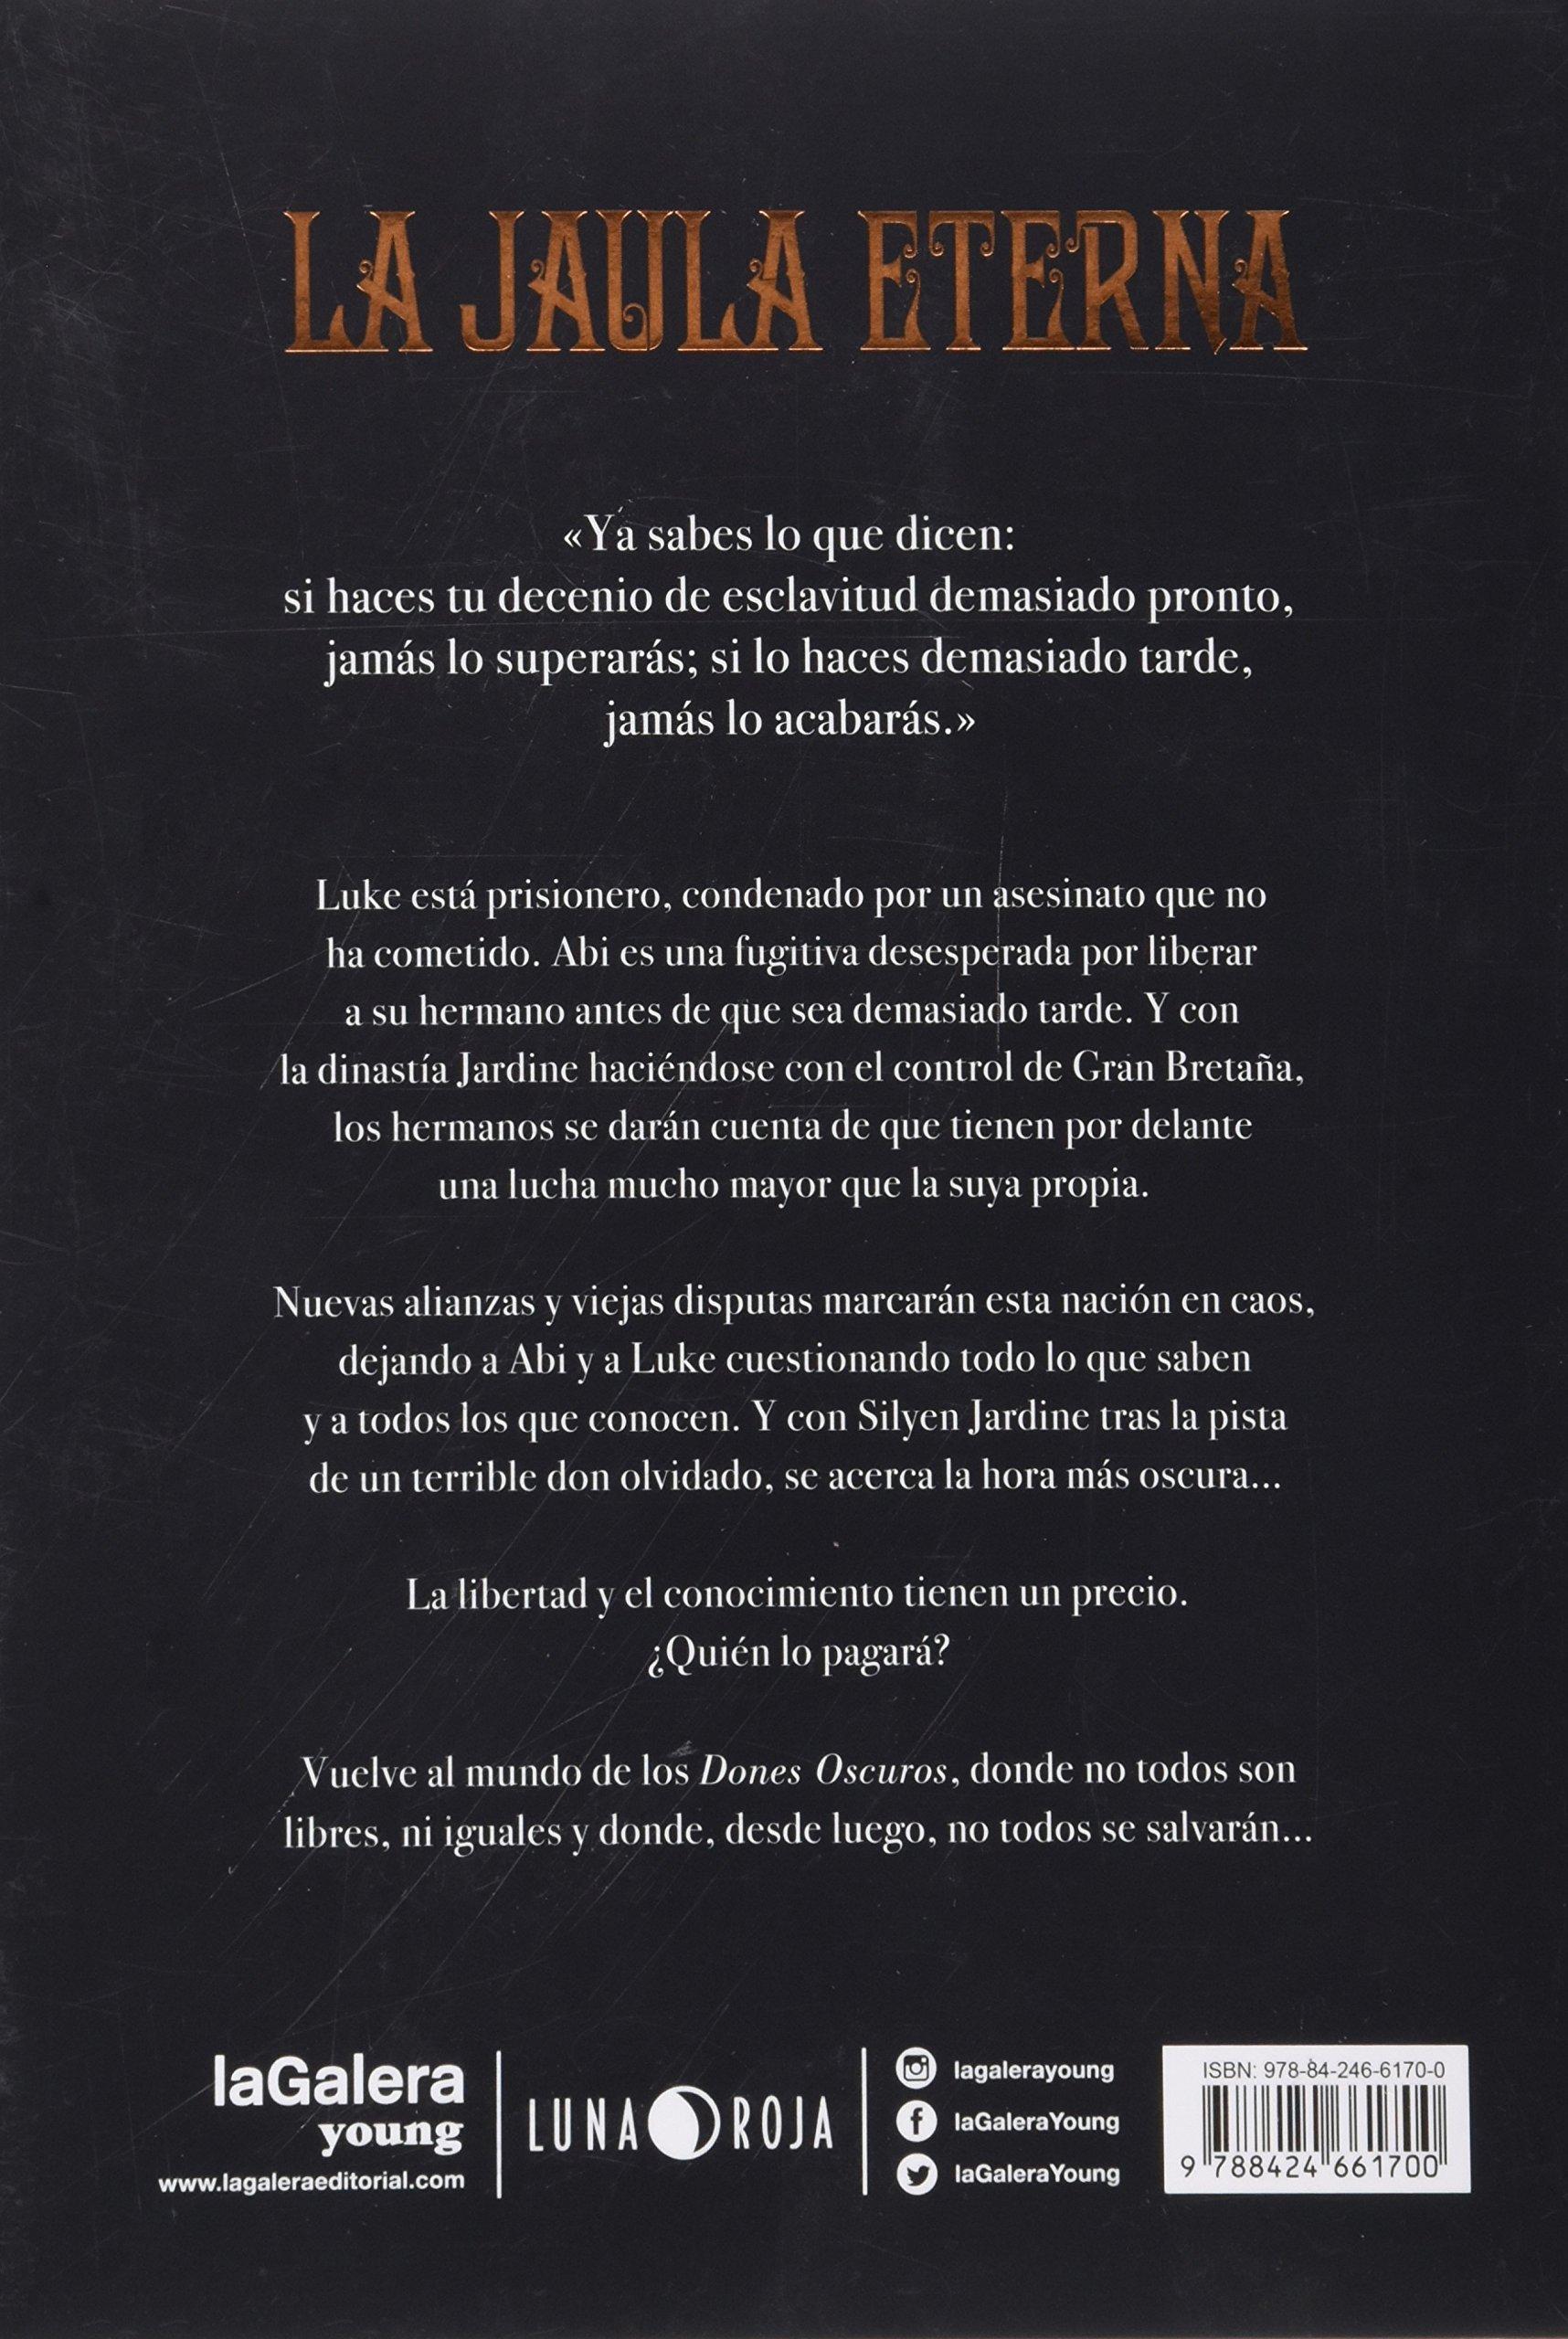 Dones Oscuros 2. La jaula eterna: 40 (Luna roja): Amazon.es: Vic ...